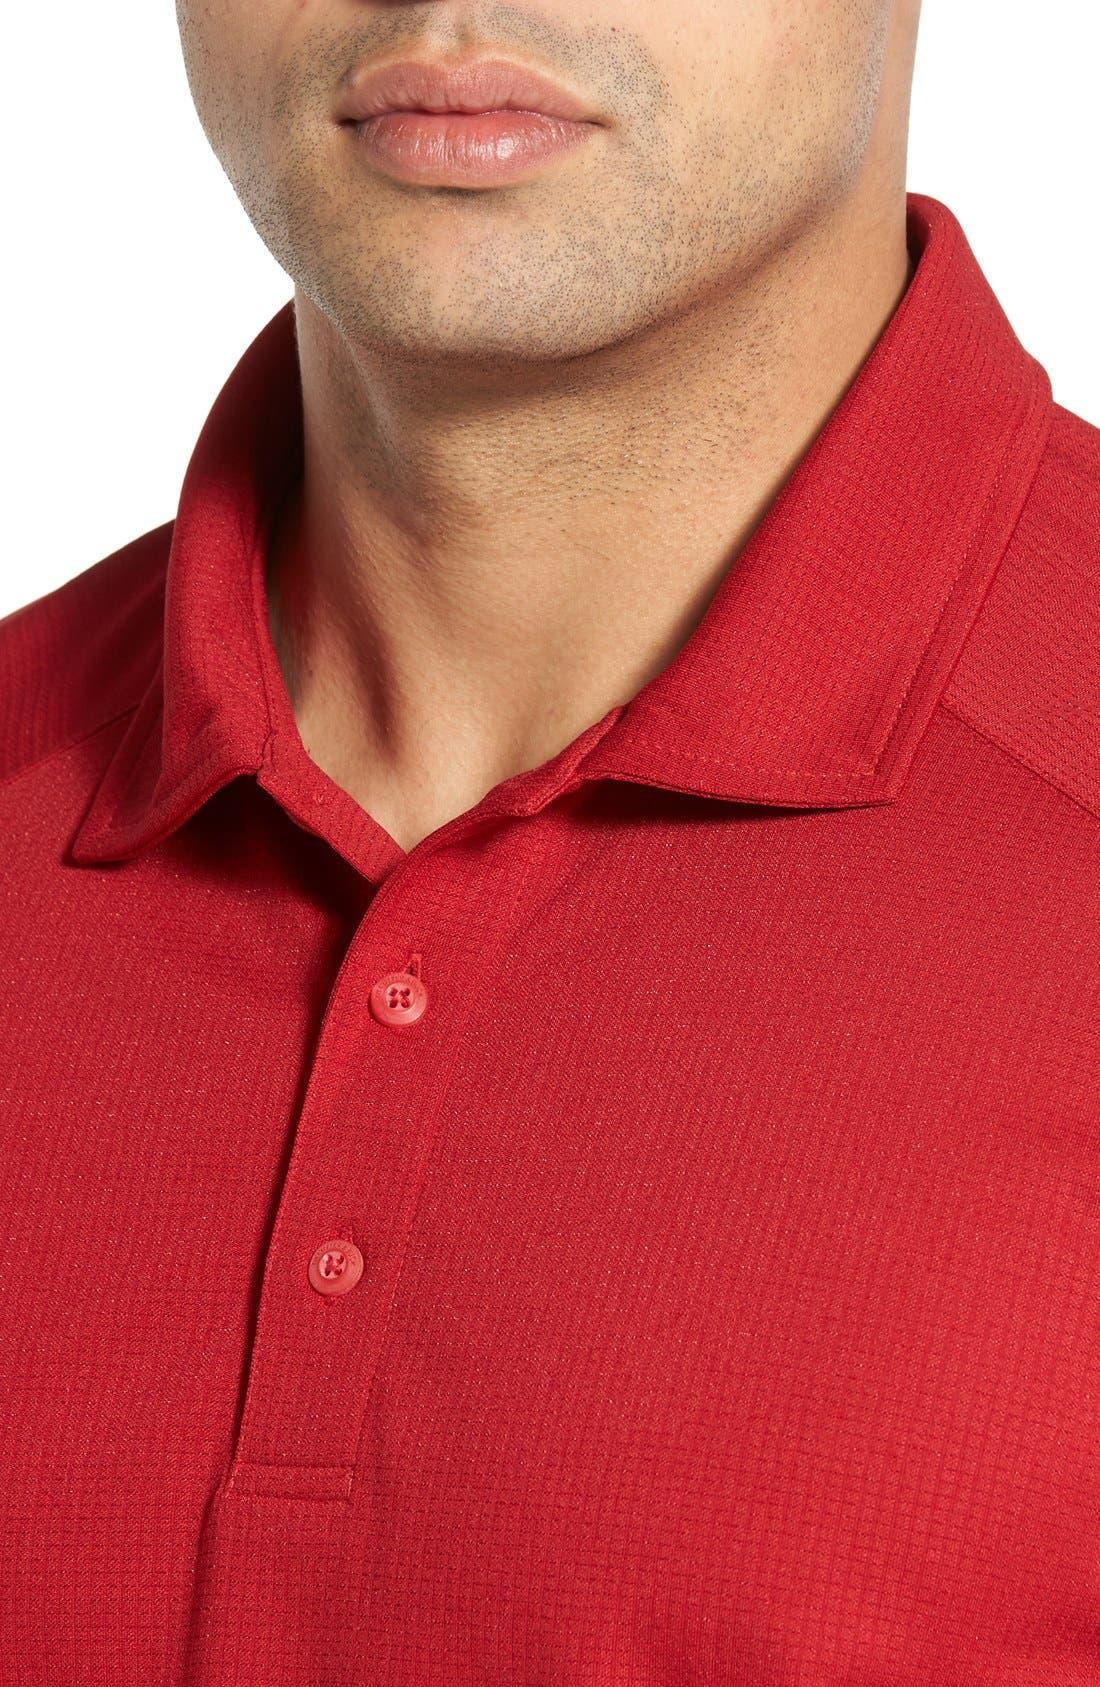 'Genre' DryTec Moisture Wicking Polo,                             Alternate thumbnail 5, color,                             CARDINAL RED